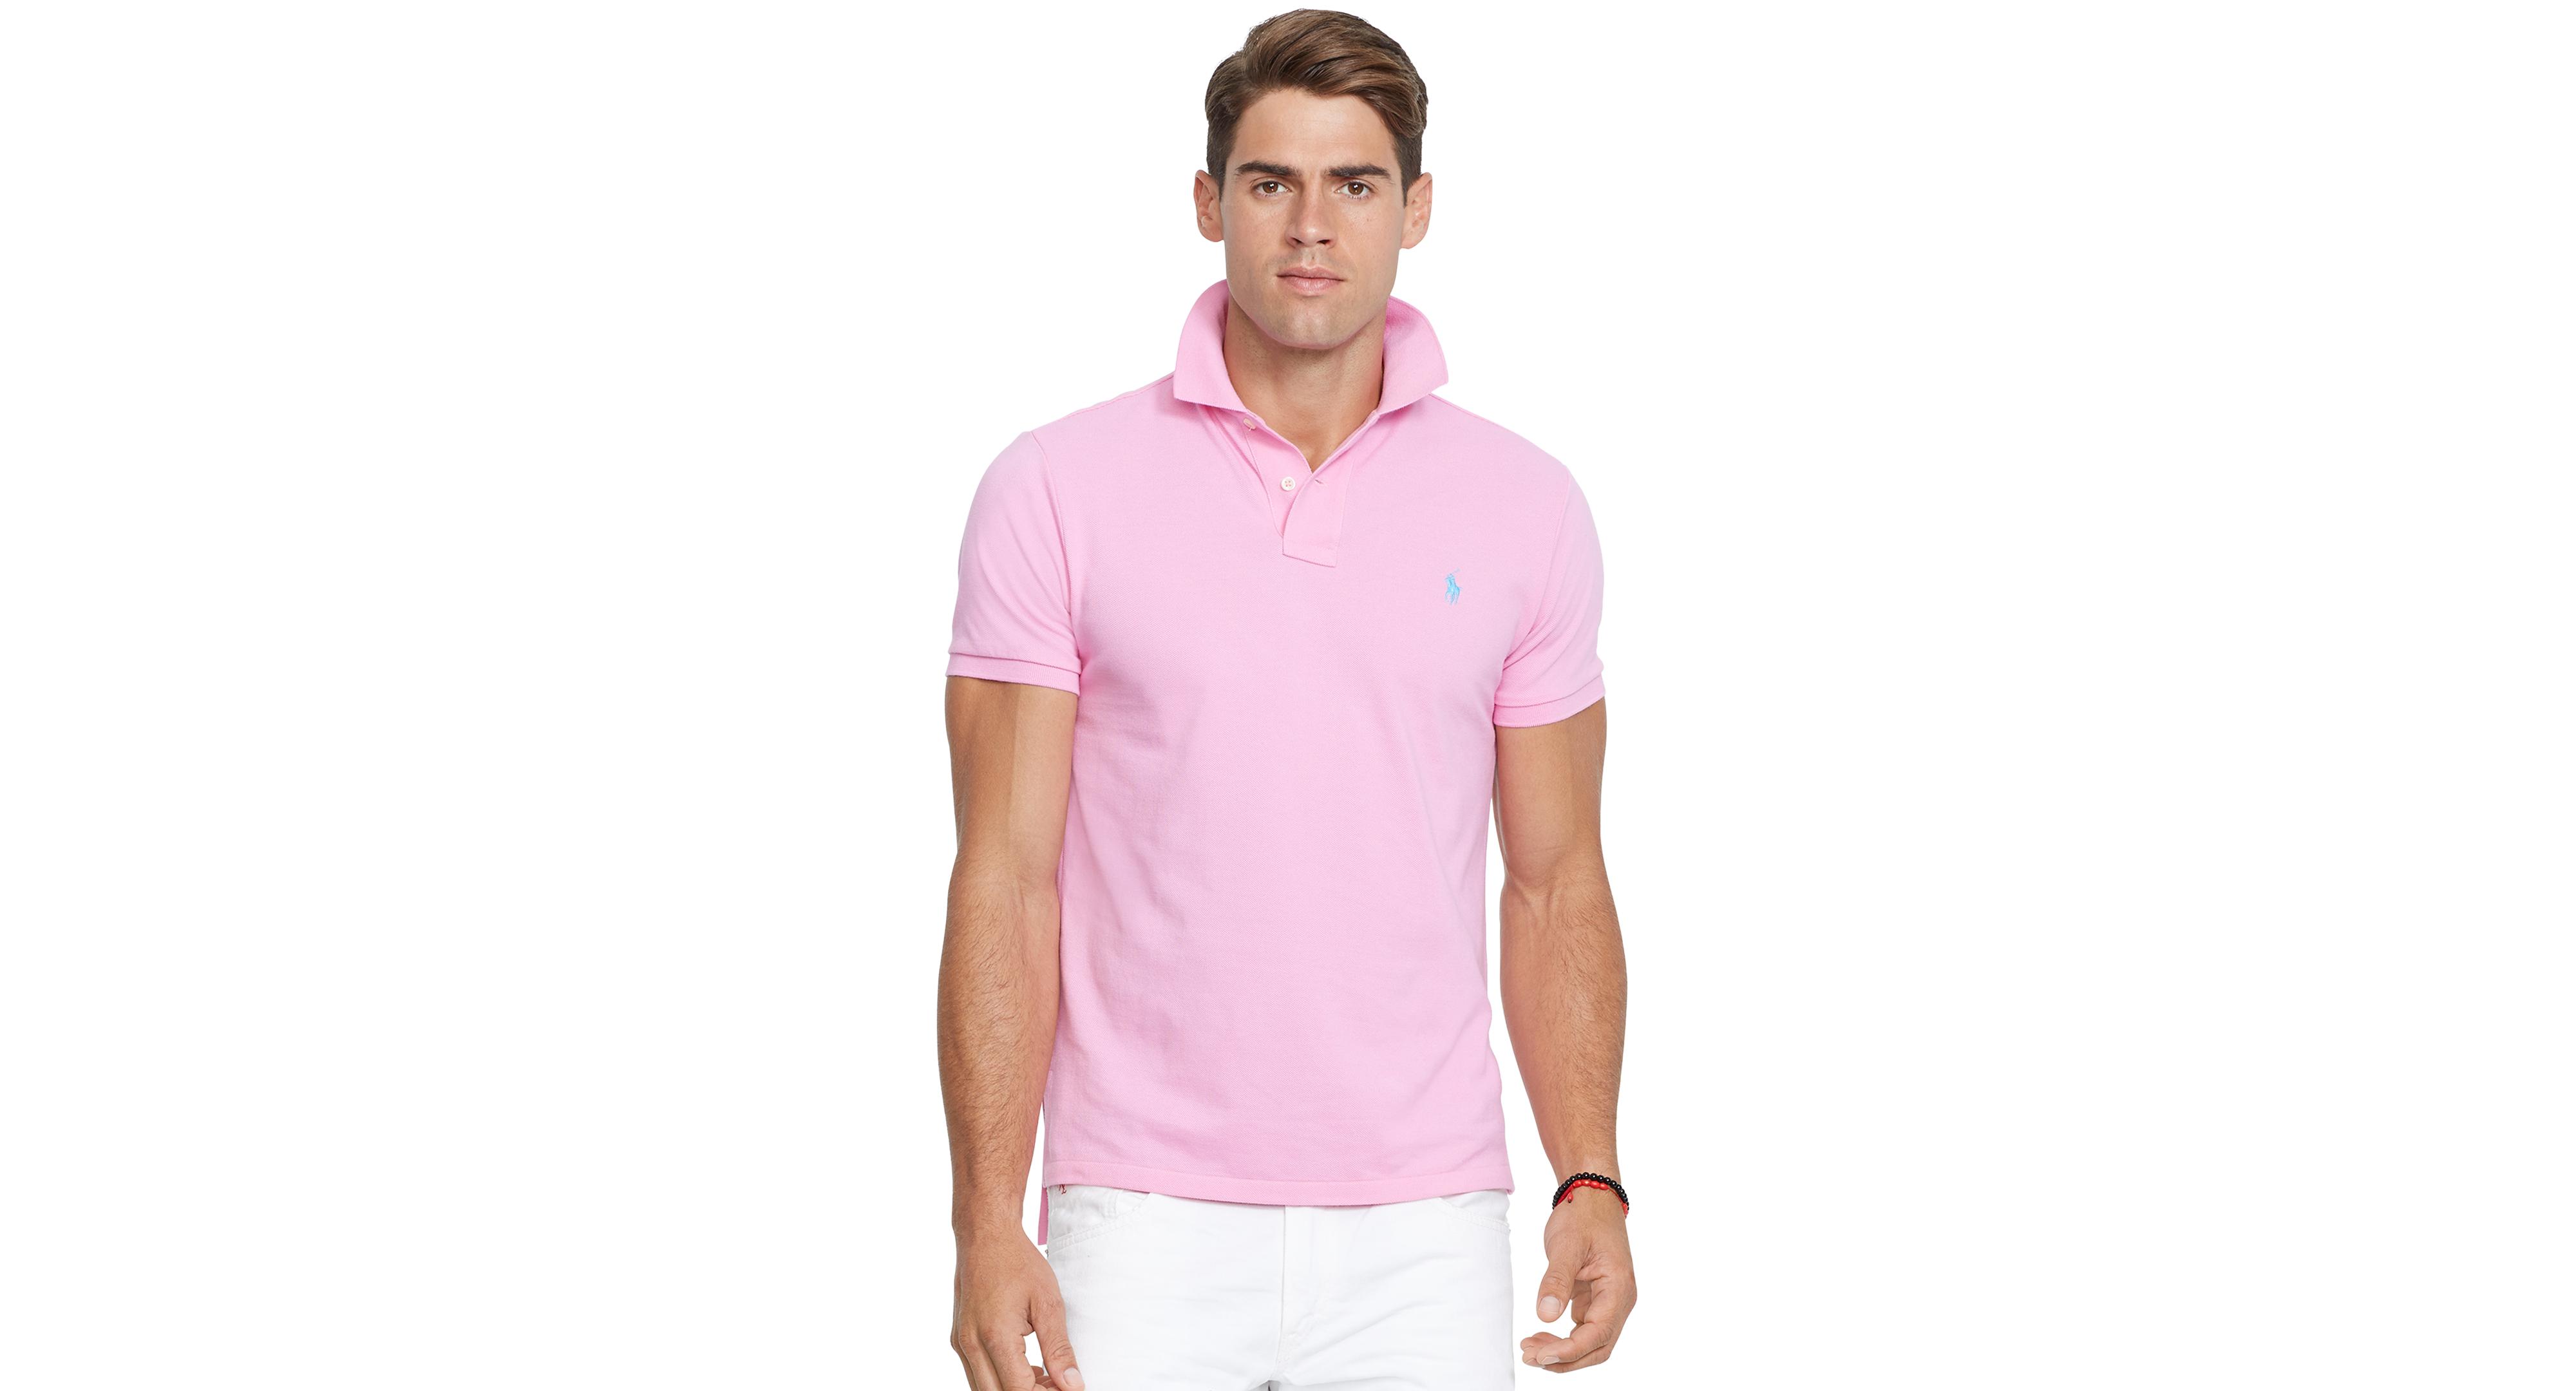 e0301608 Polo Ralph Lauren Custom-Fit Mesh Polo Shirt | Products